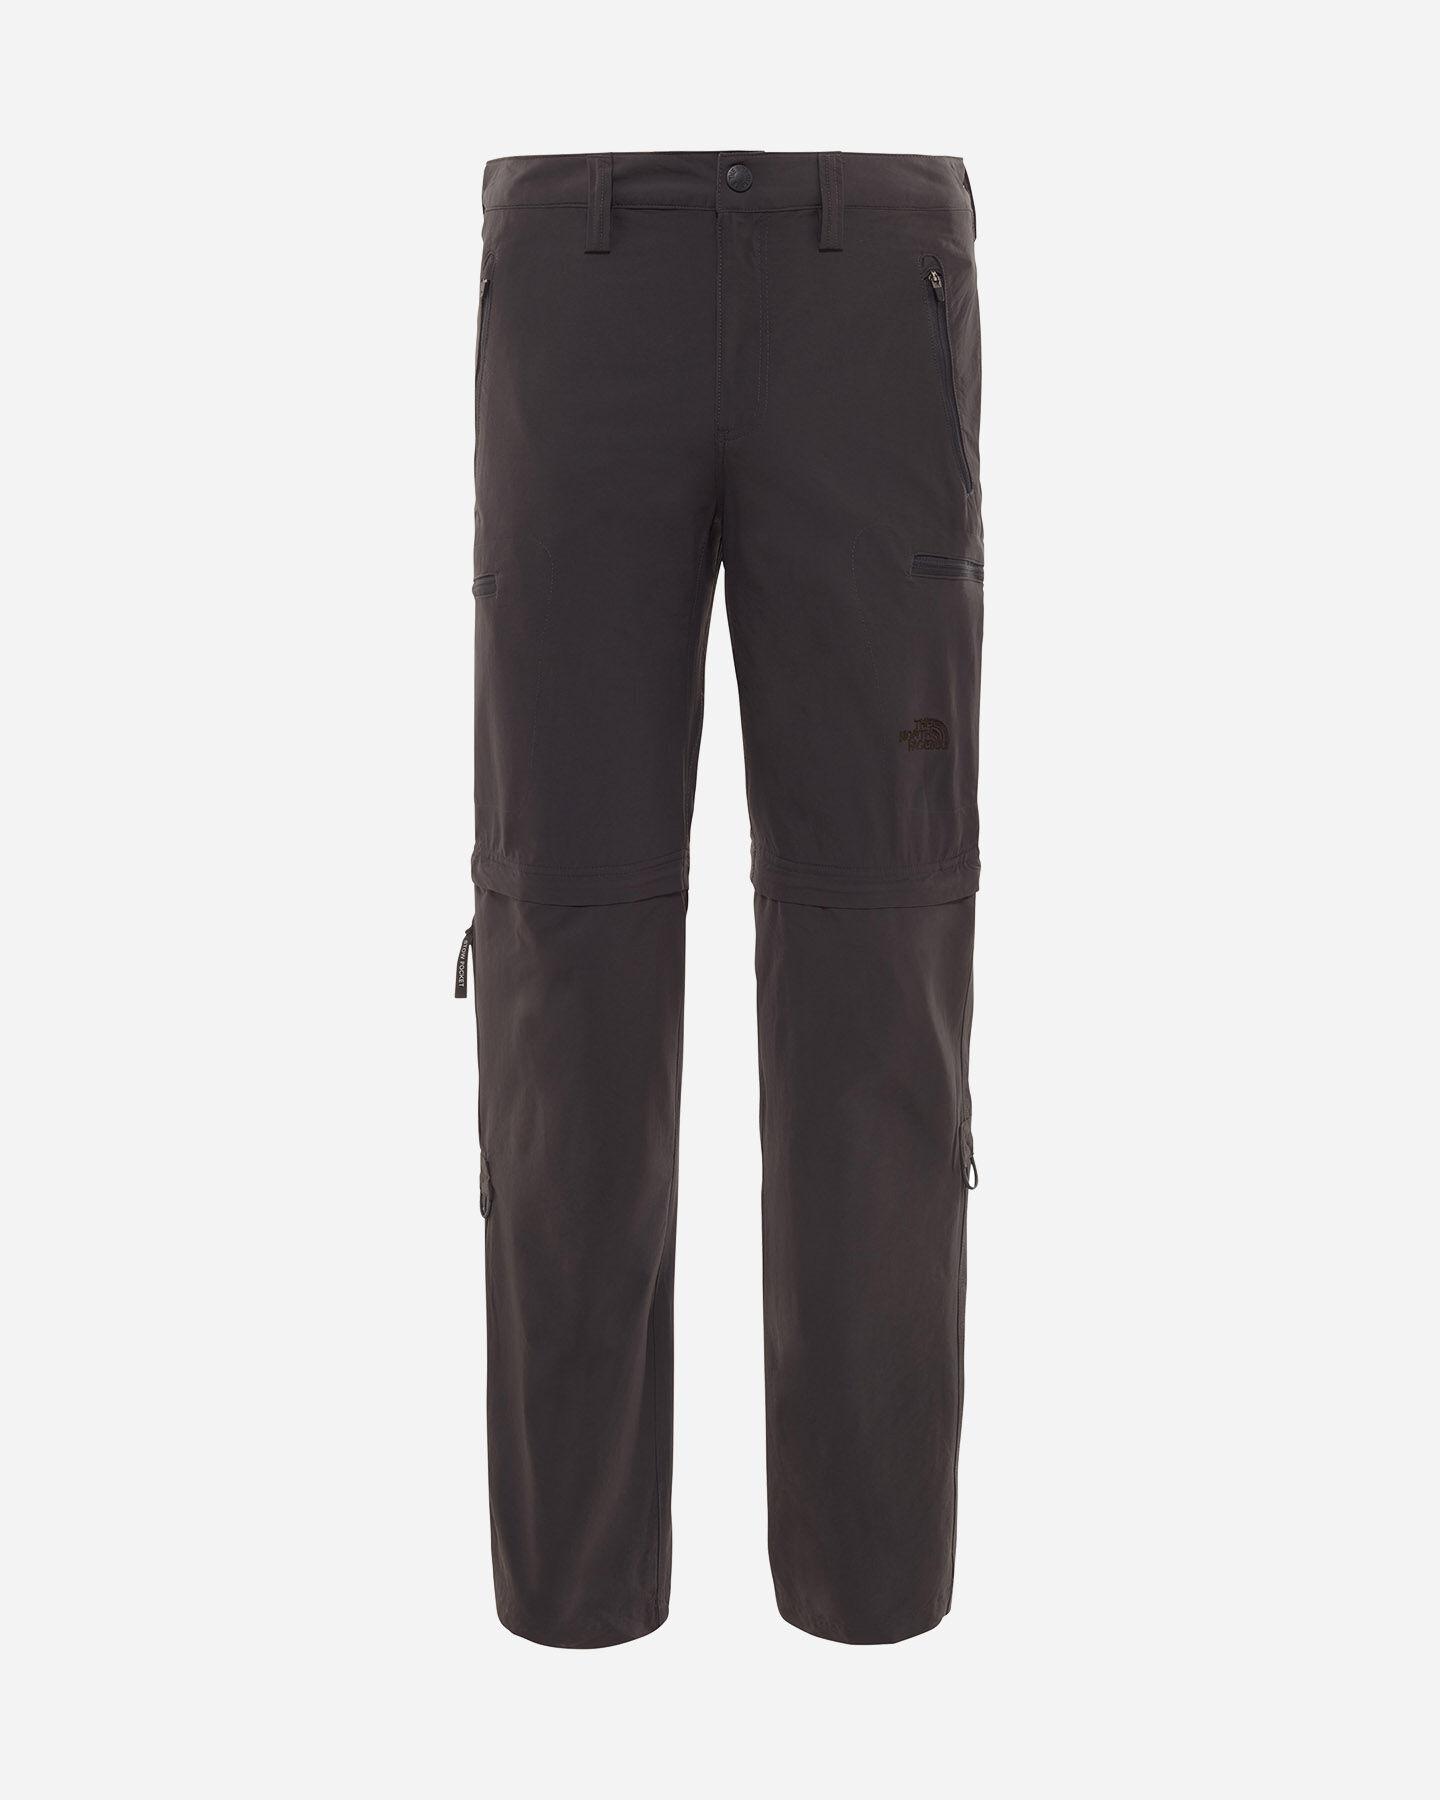 Pantalone outdoor THE NORTH FACE EXPLORATION CONV M S4021651 scatto 0